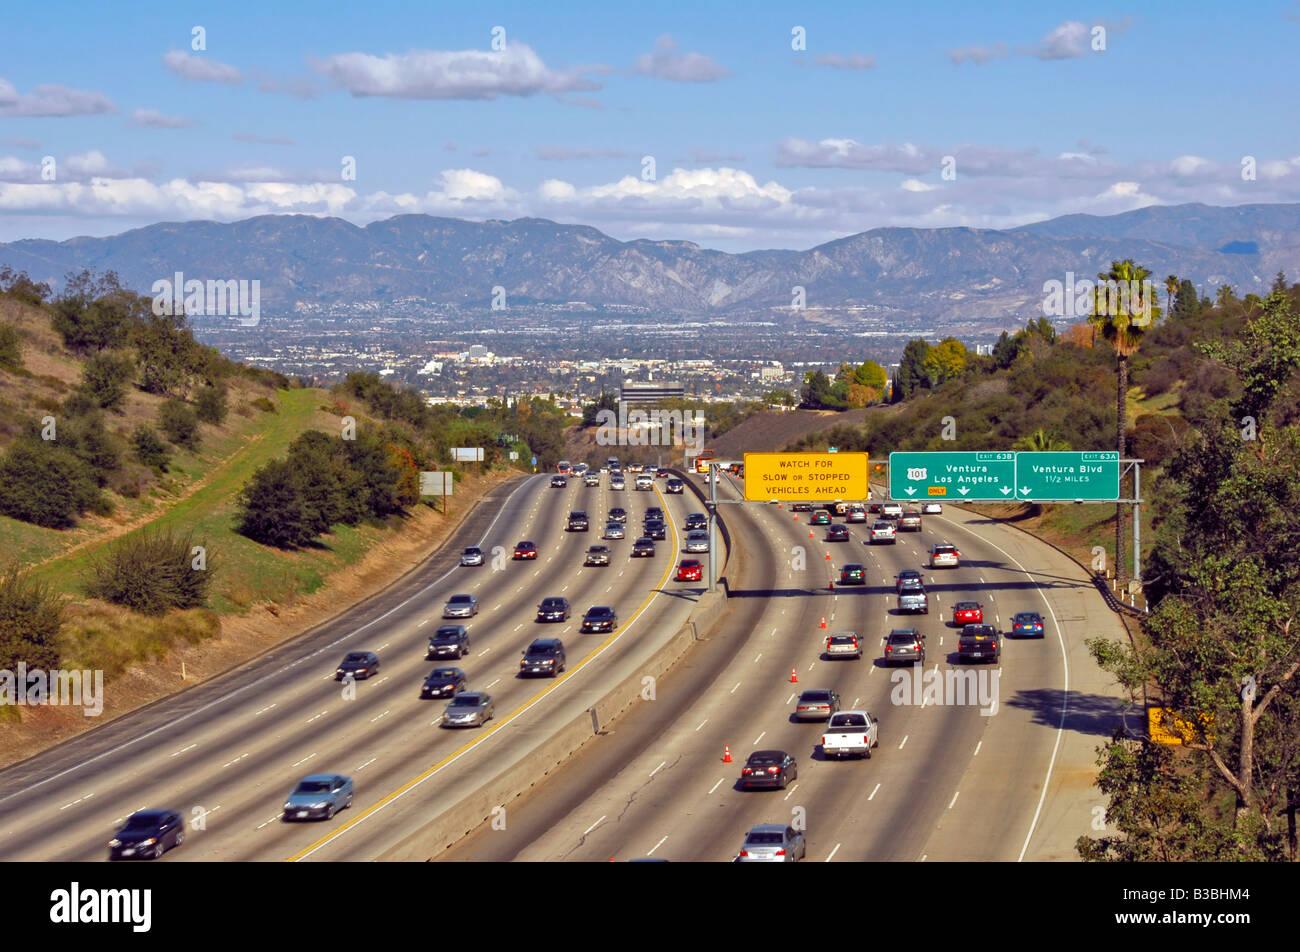 San Diego 405 Freeway Stock Photos & San Diego 405 Freeway